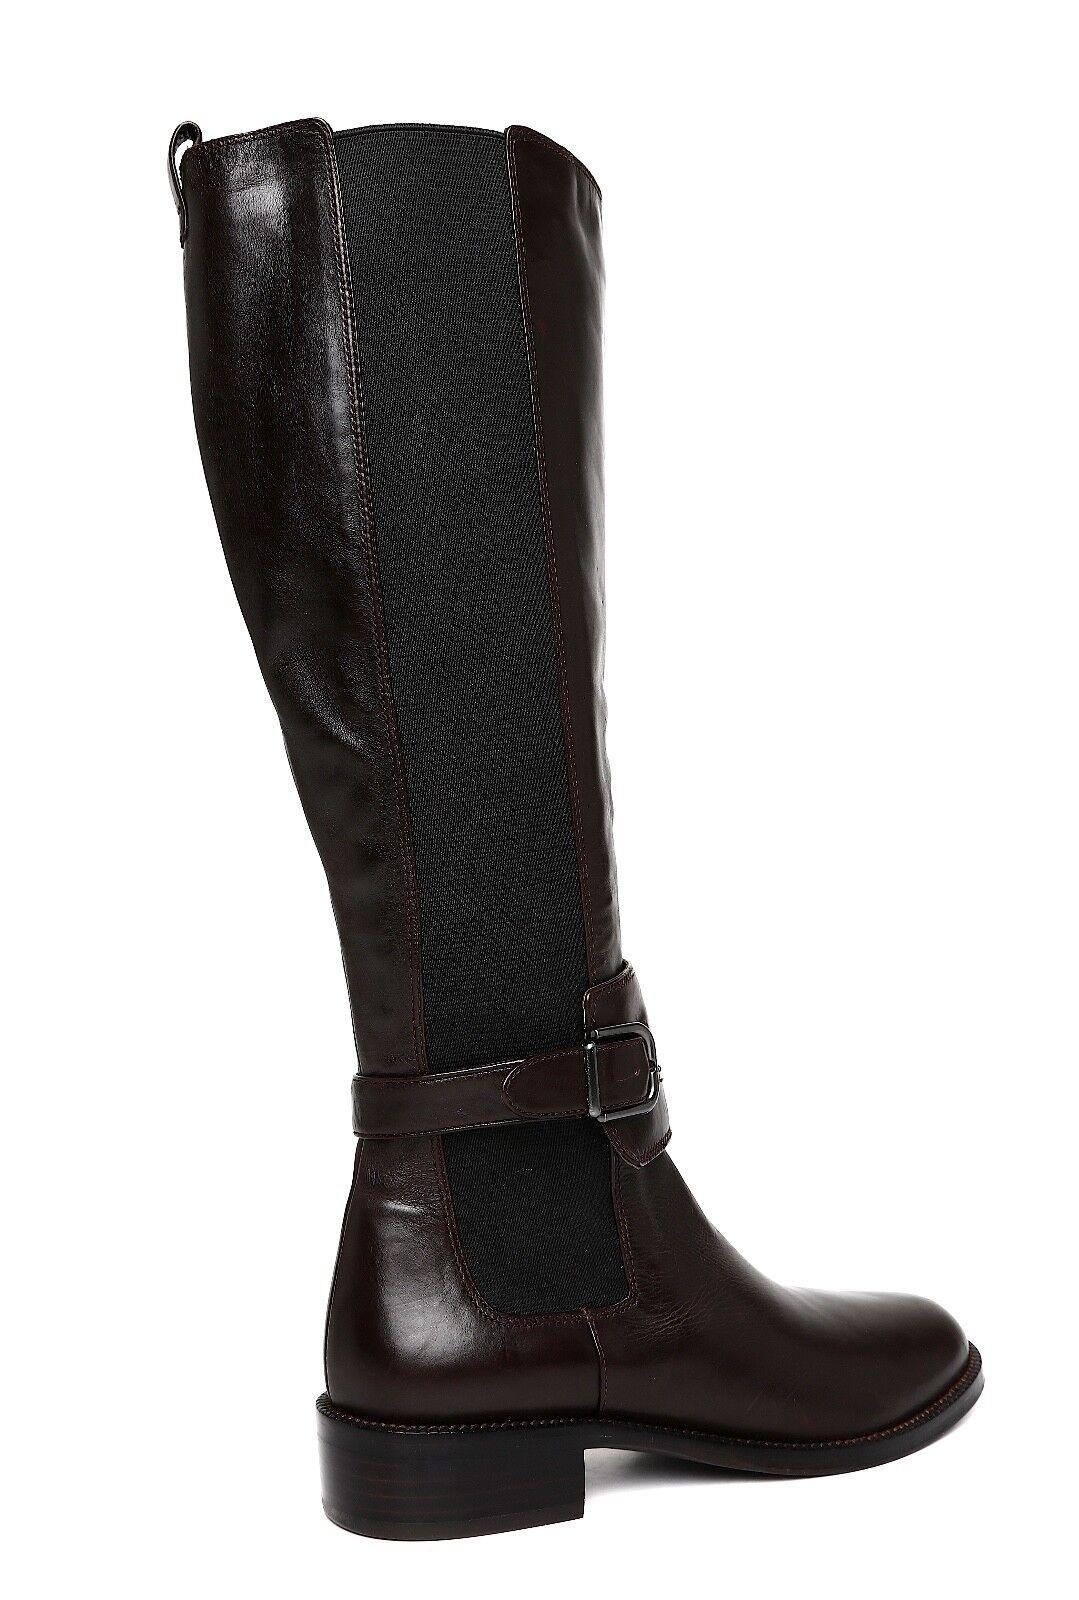 Via Spiga Bufu Tall Leather Stiefel Dark braun damen Sz Sz Sz 7 M 2050  55424c